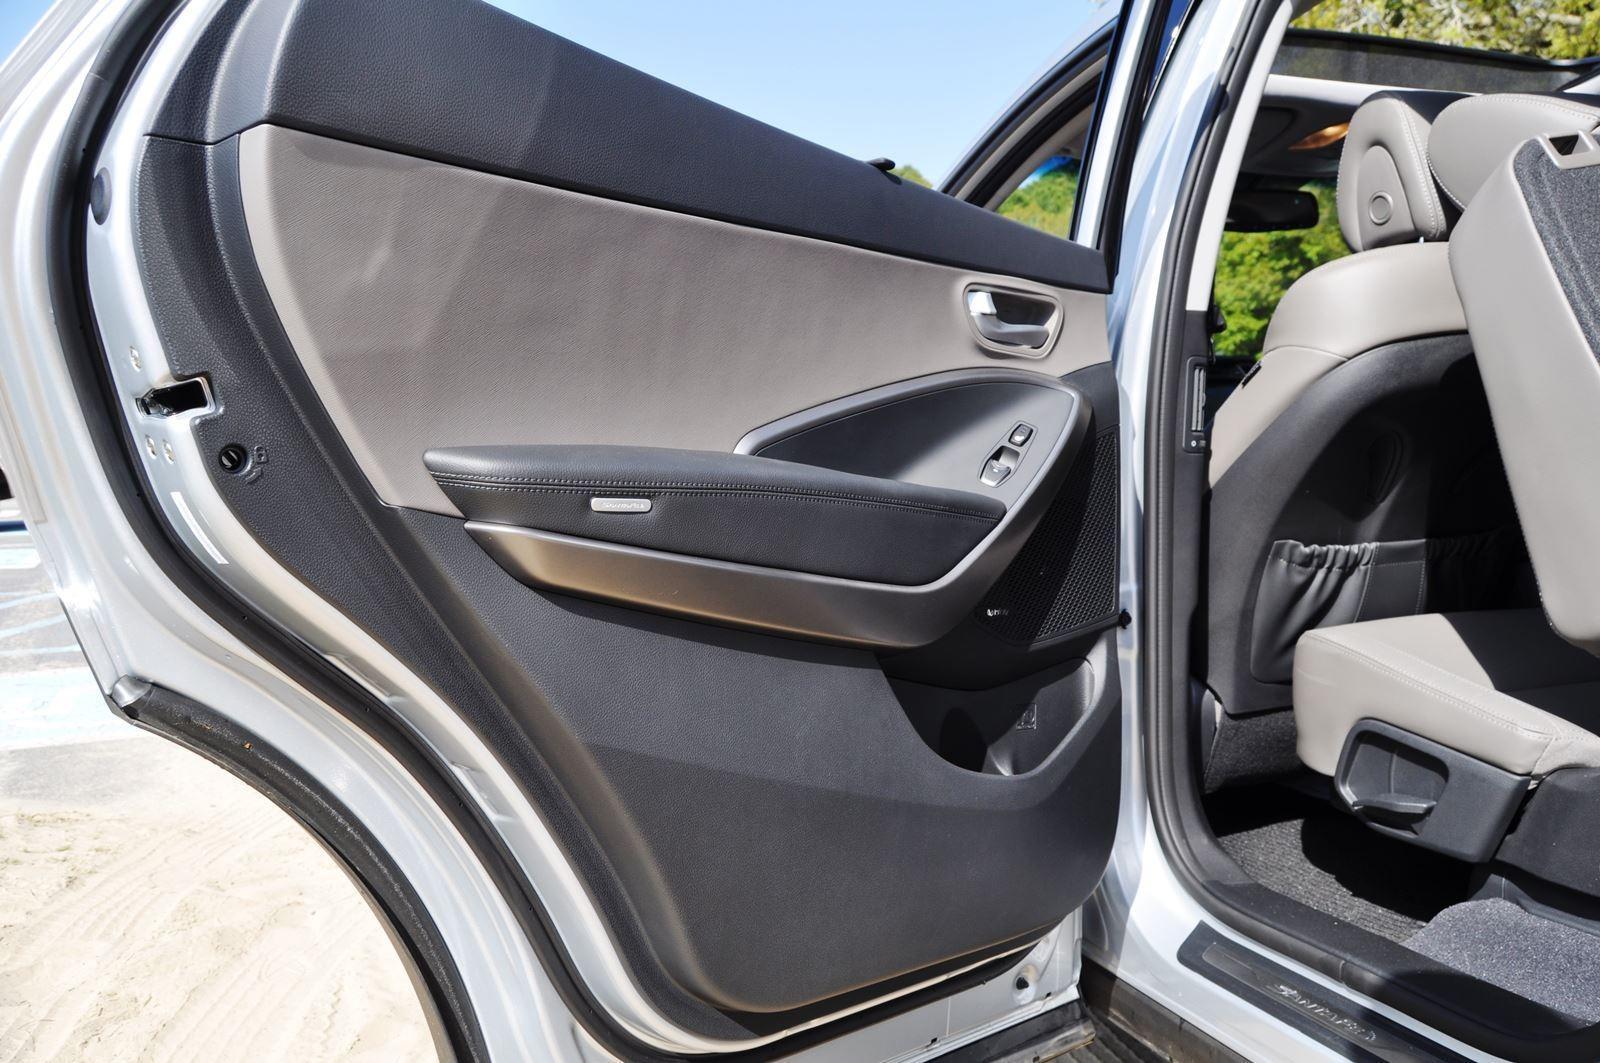 2015 Hyundai Santa Fe LWB Ultimate - Interior Photos 6